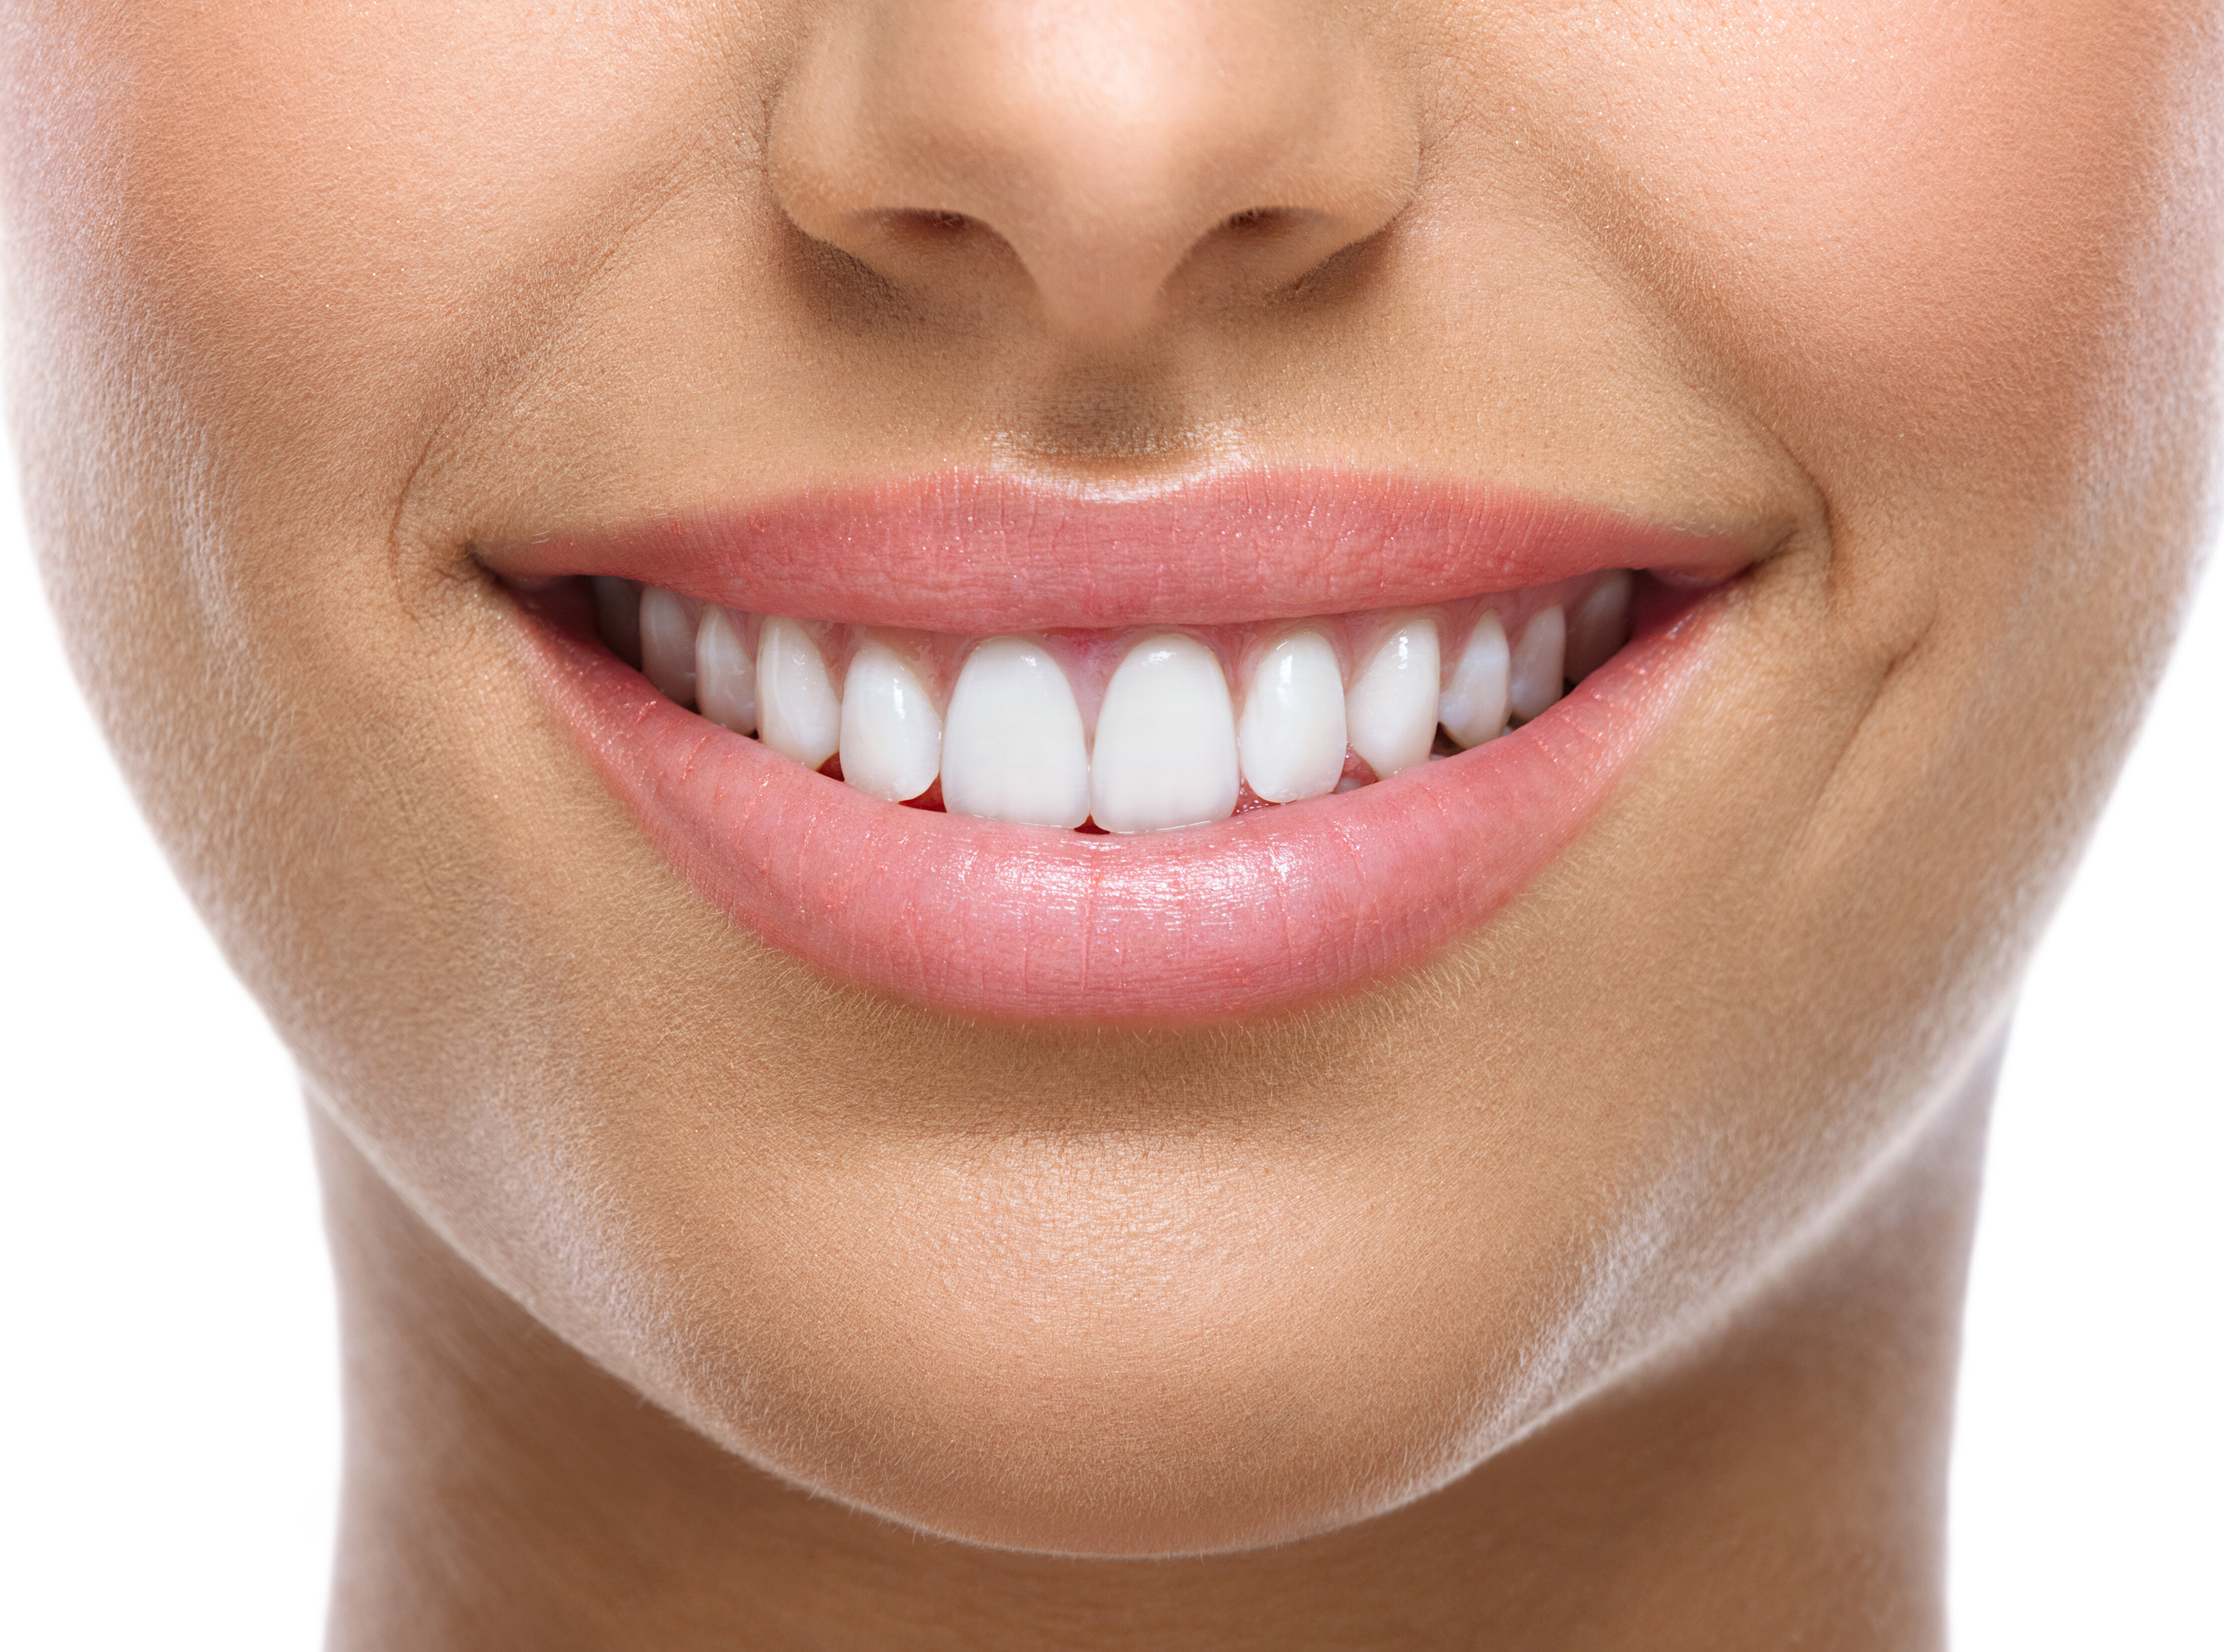 Ästhetische Zahnmedizin in Istanbul – Zahn-Bleaching